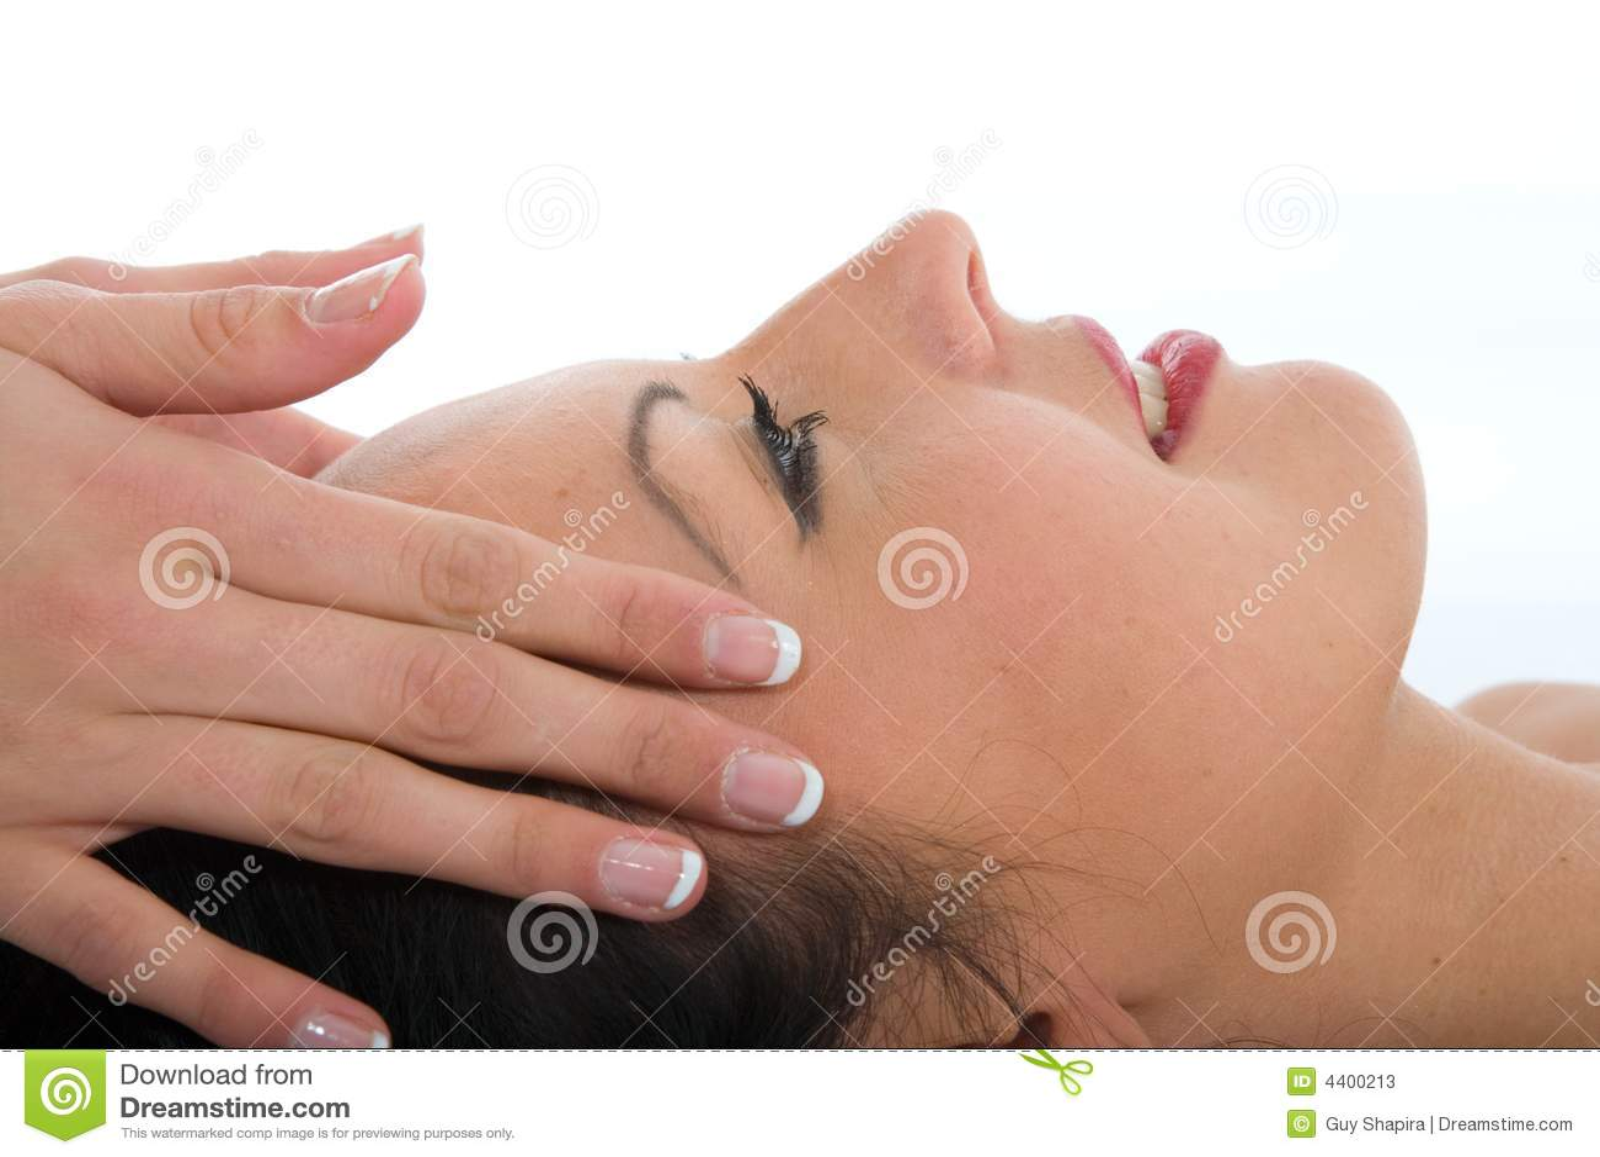 massage sax video video massage sex